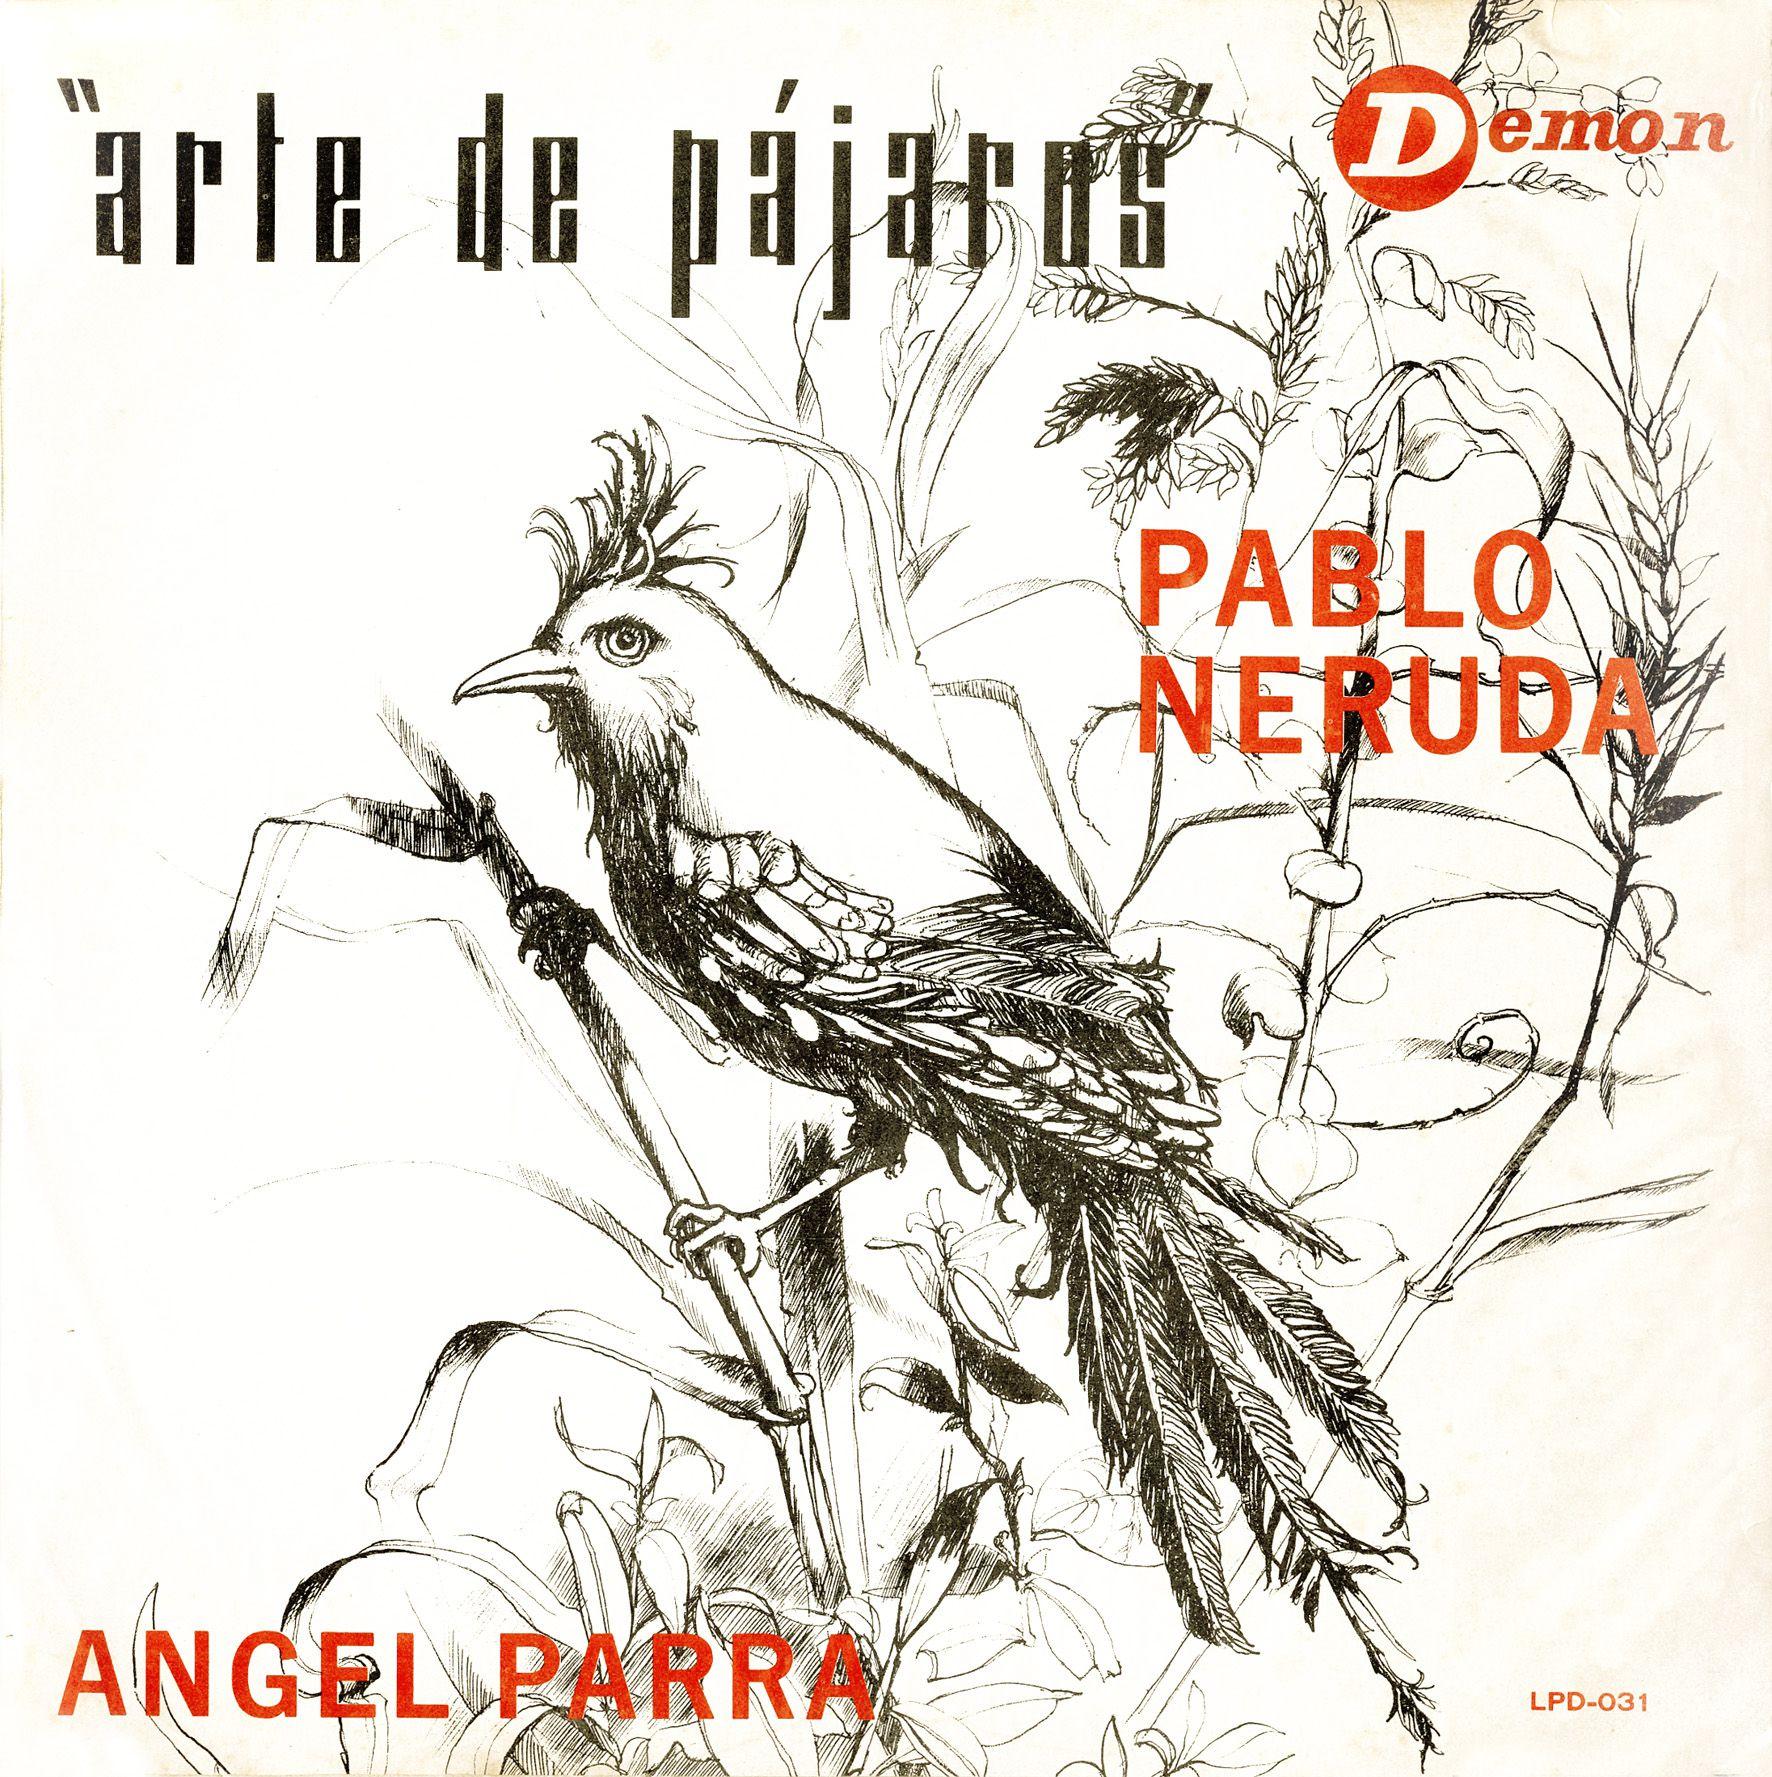 Pablo Neruda Les Vrais Voyageurs